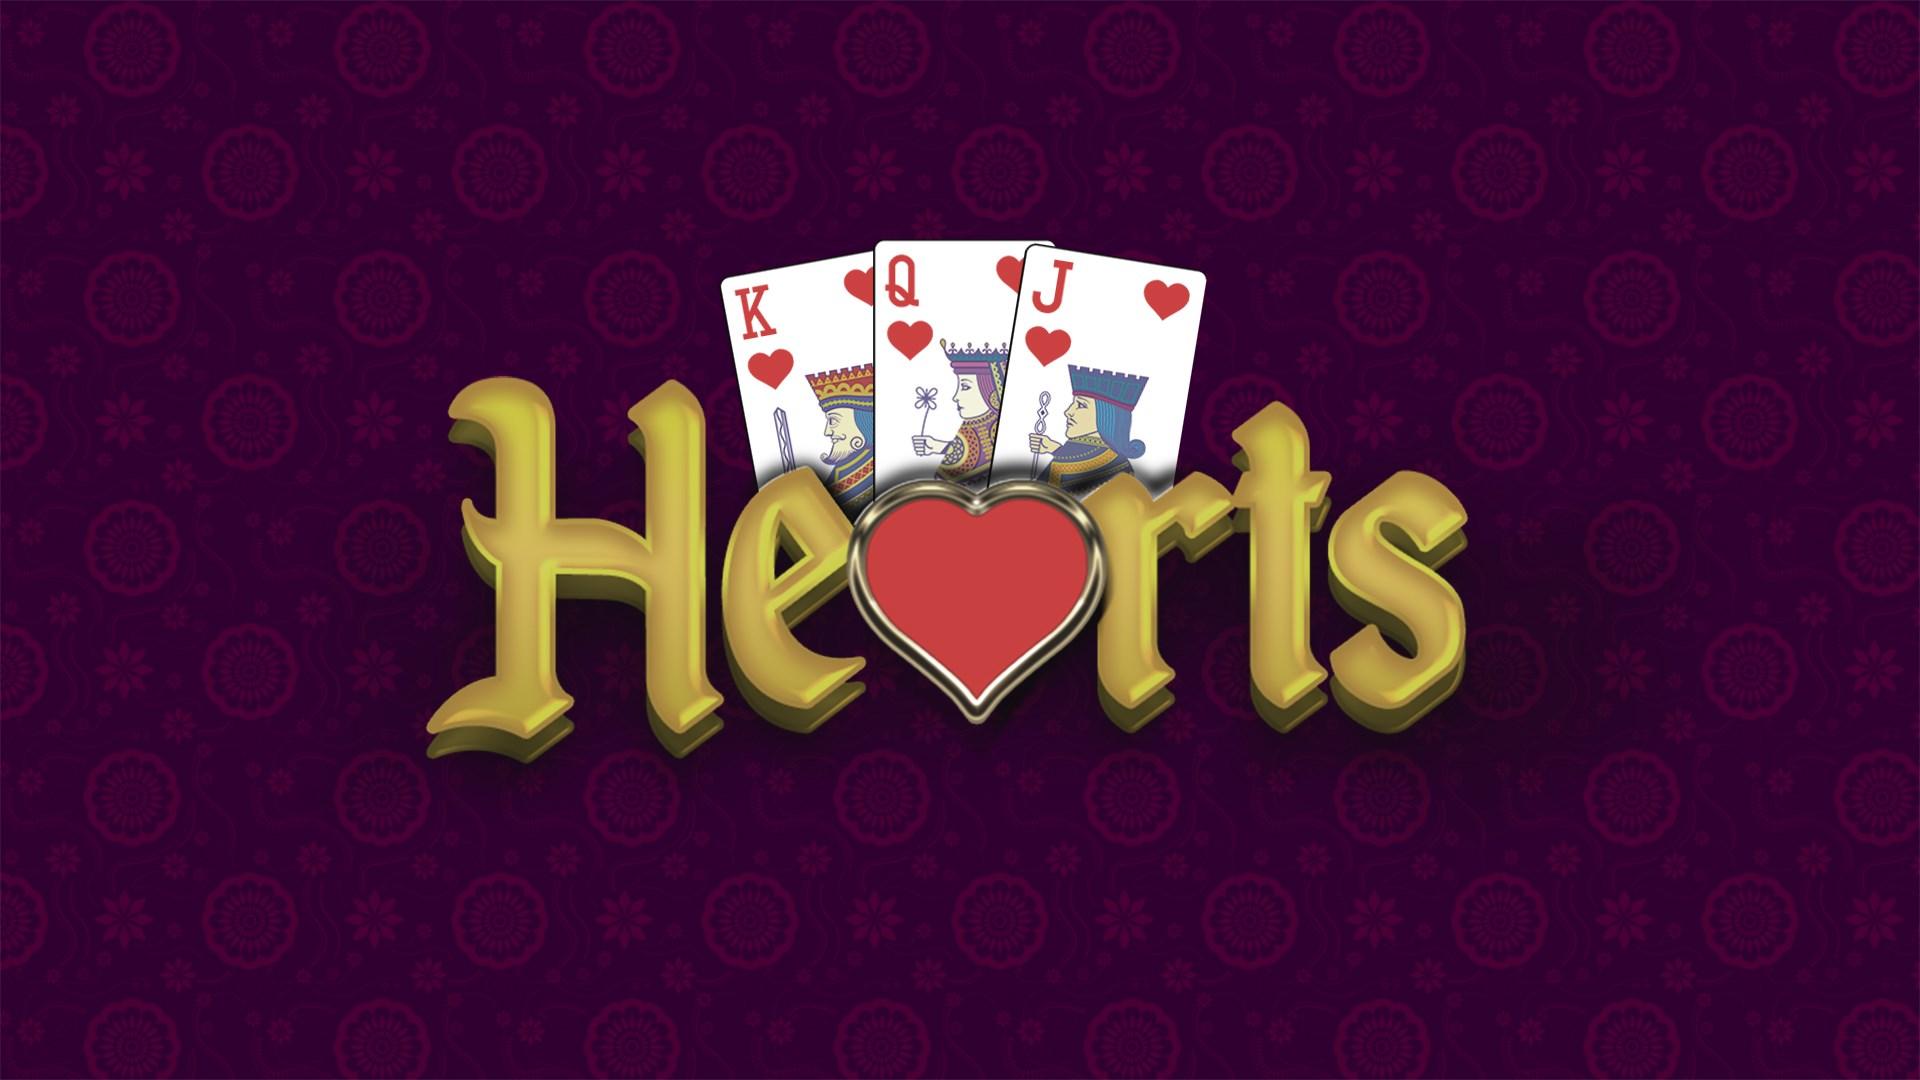 Games Hearts